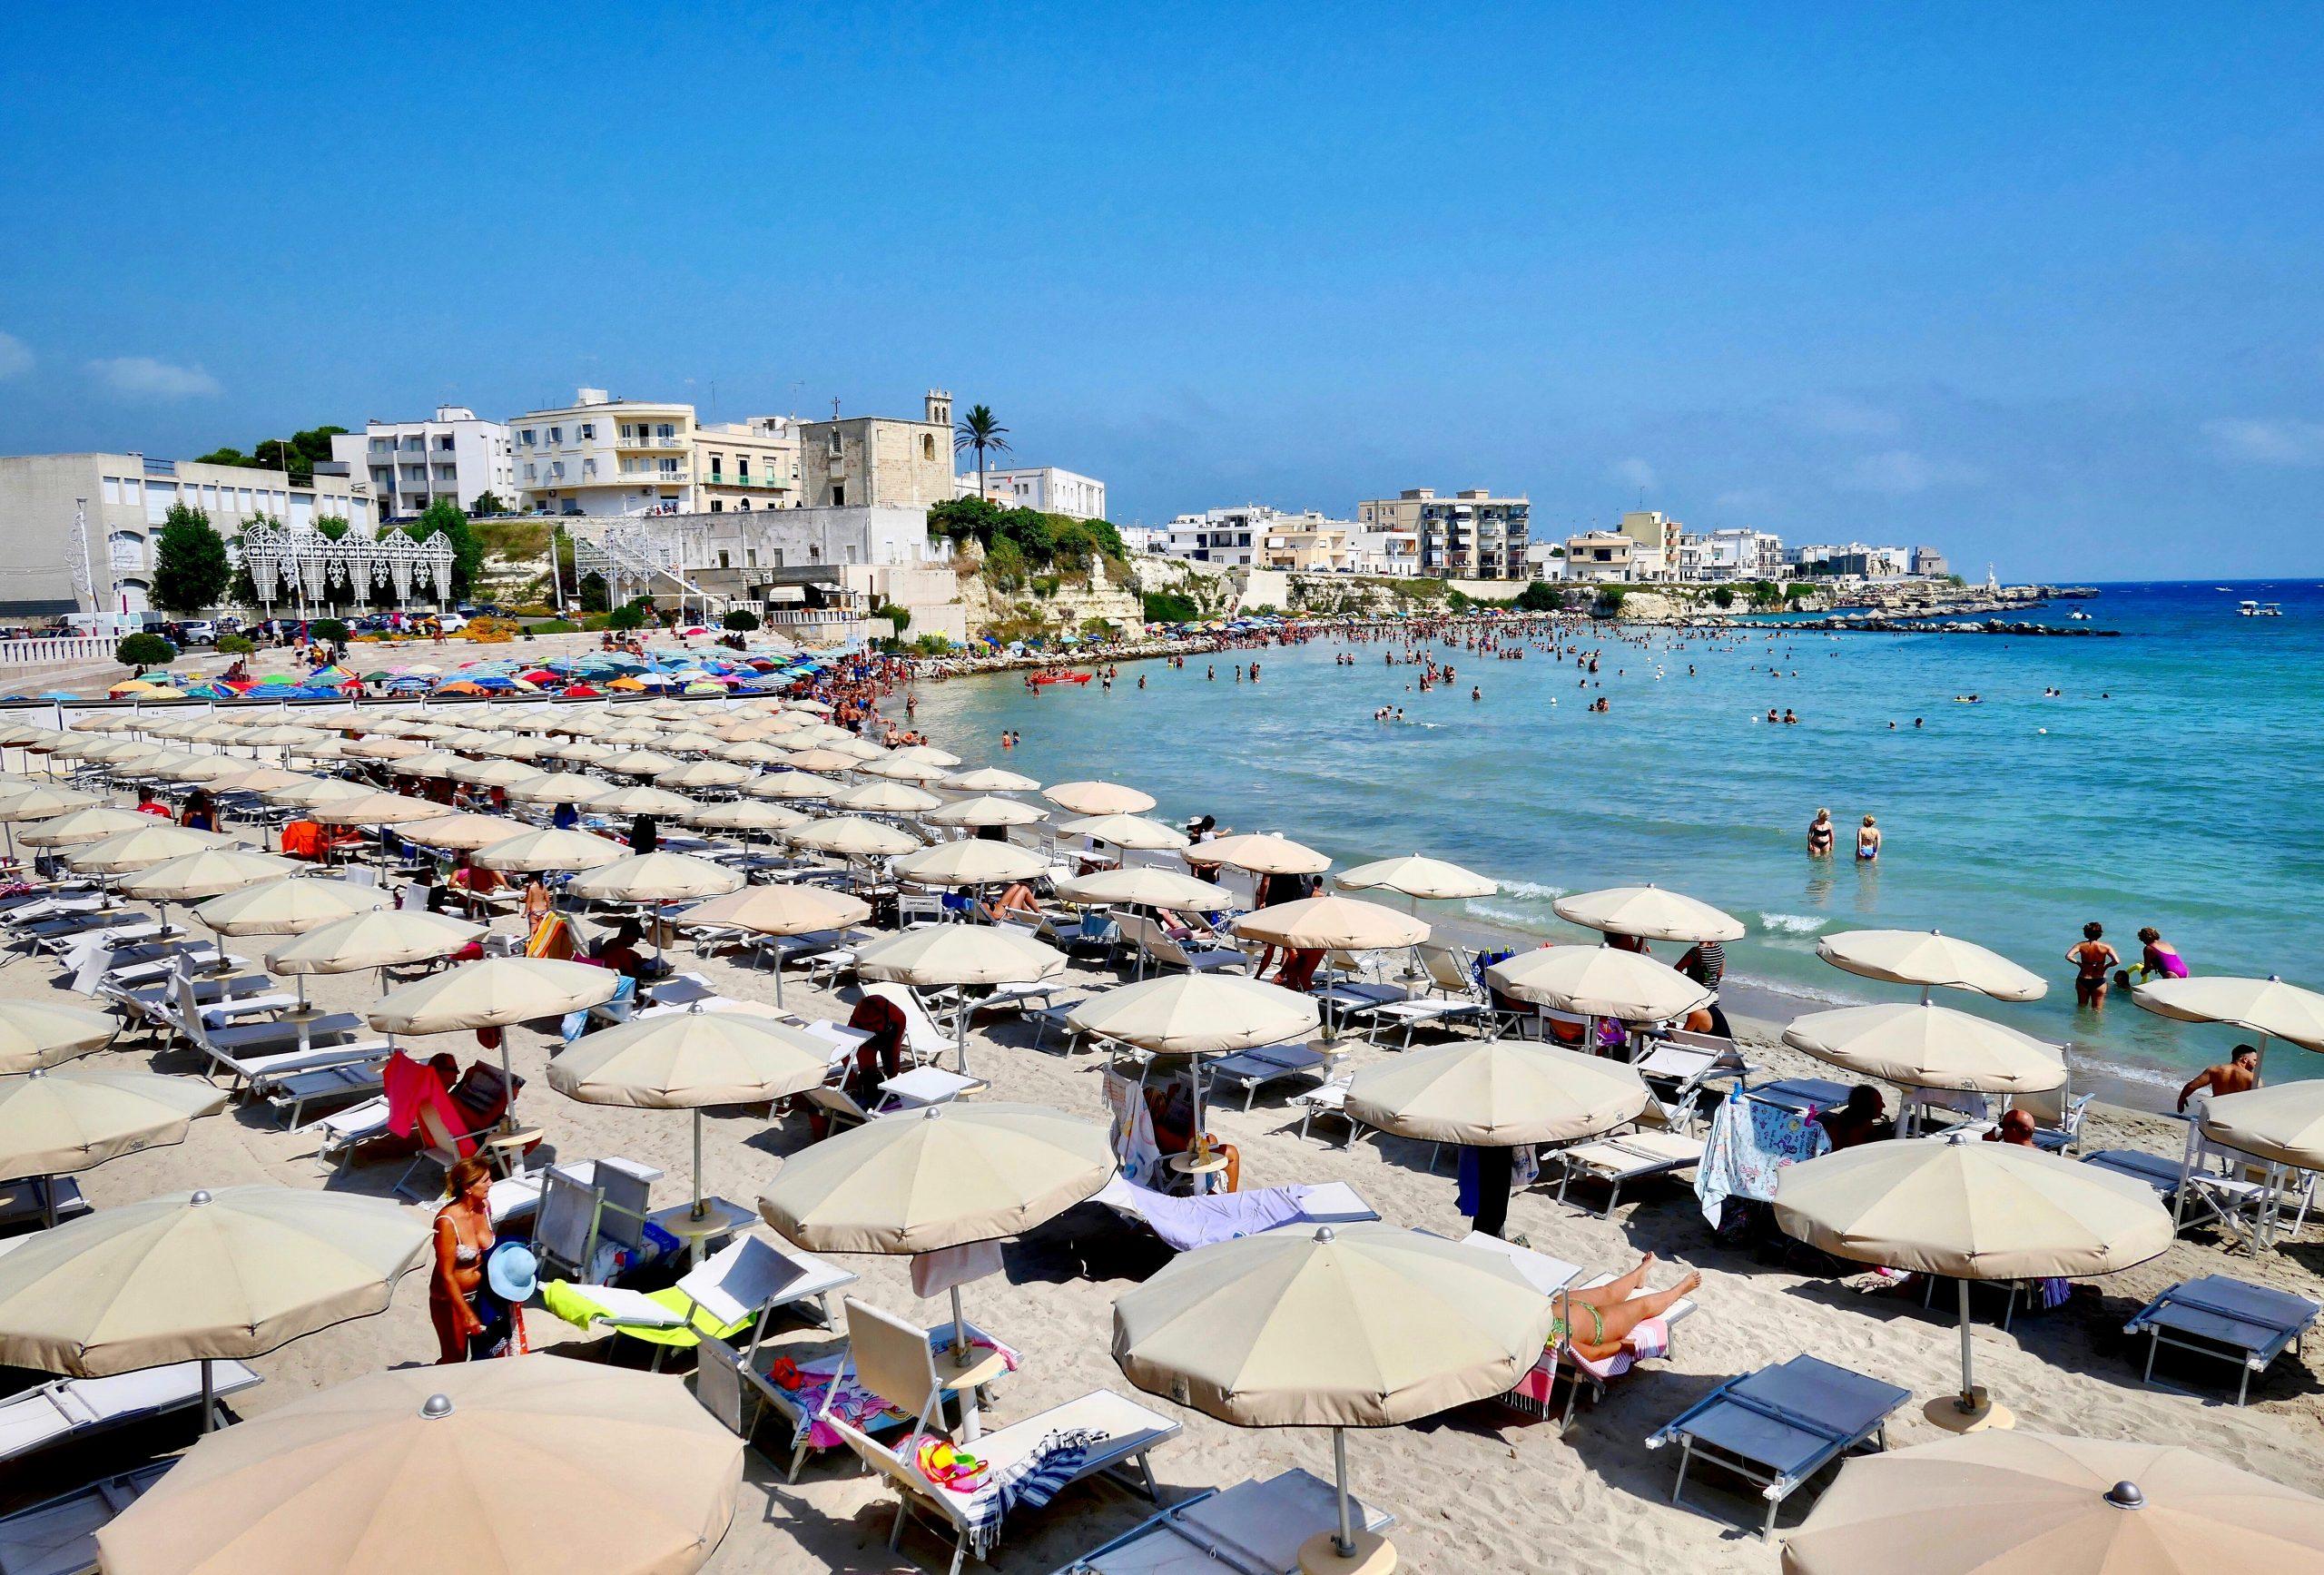 Beach view Puglia Italy